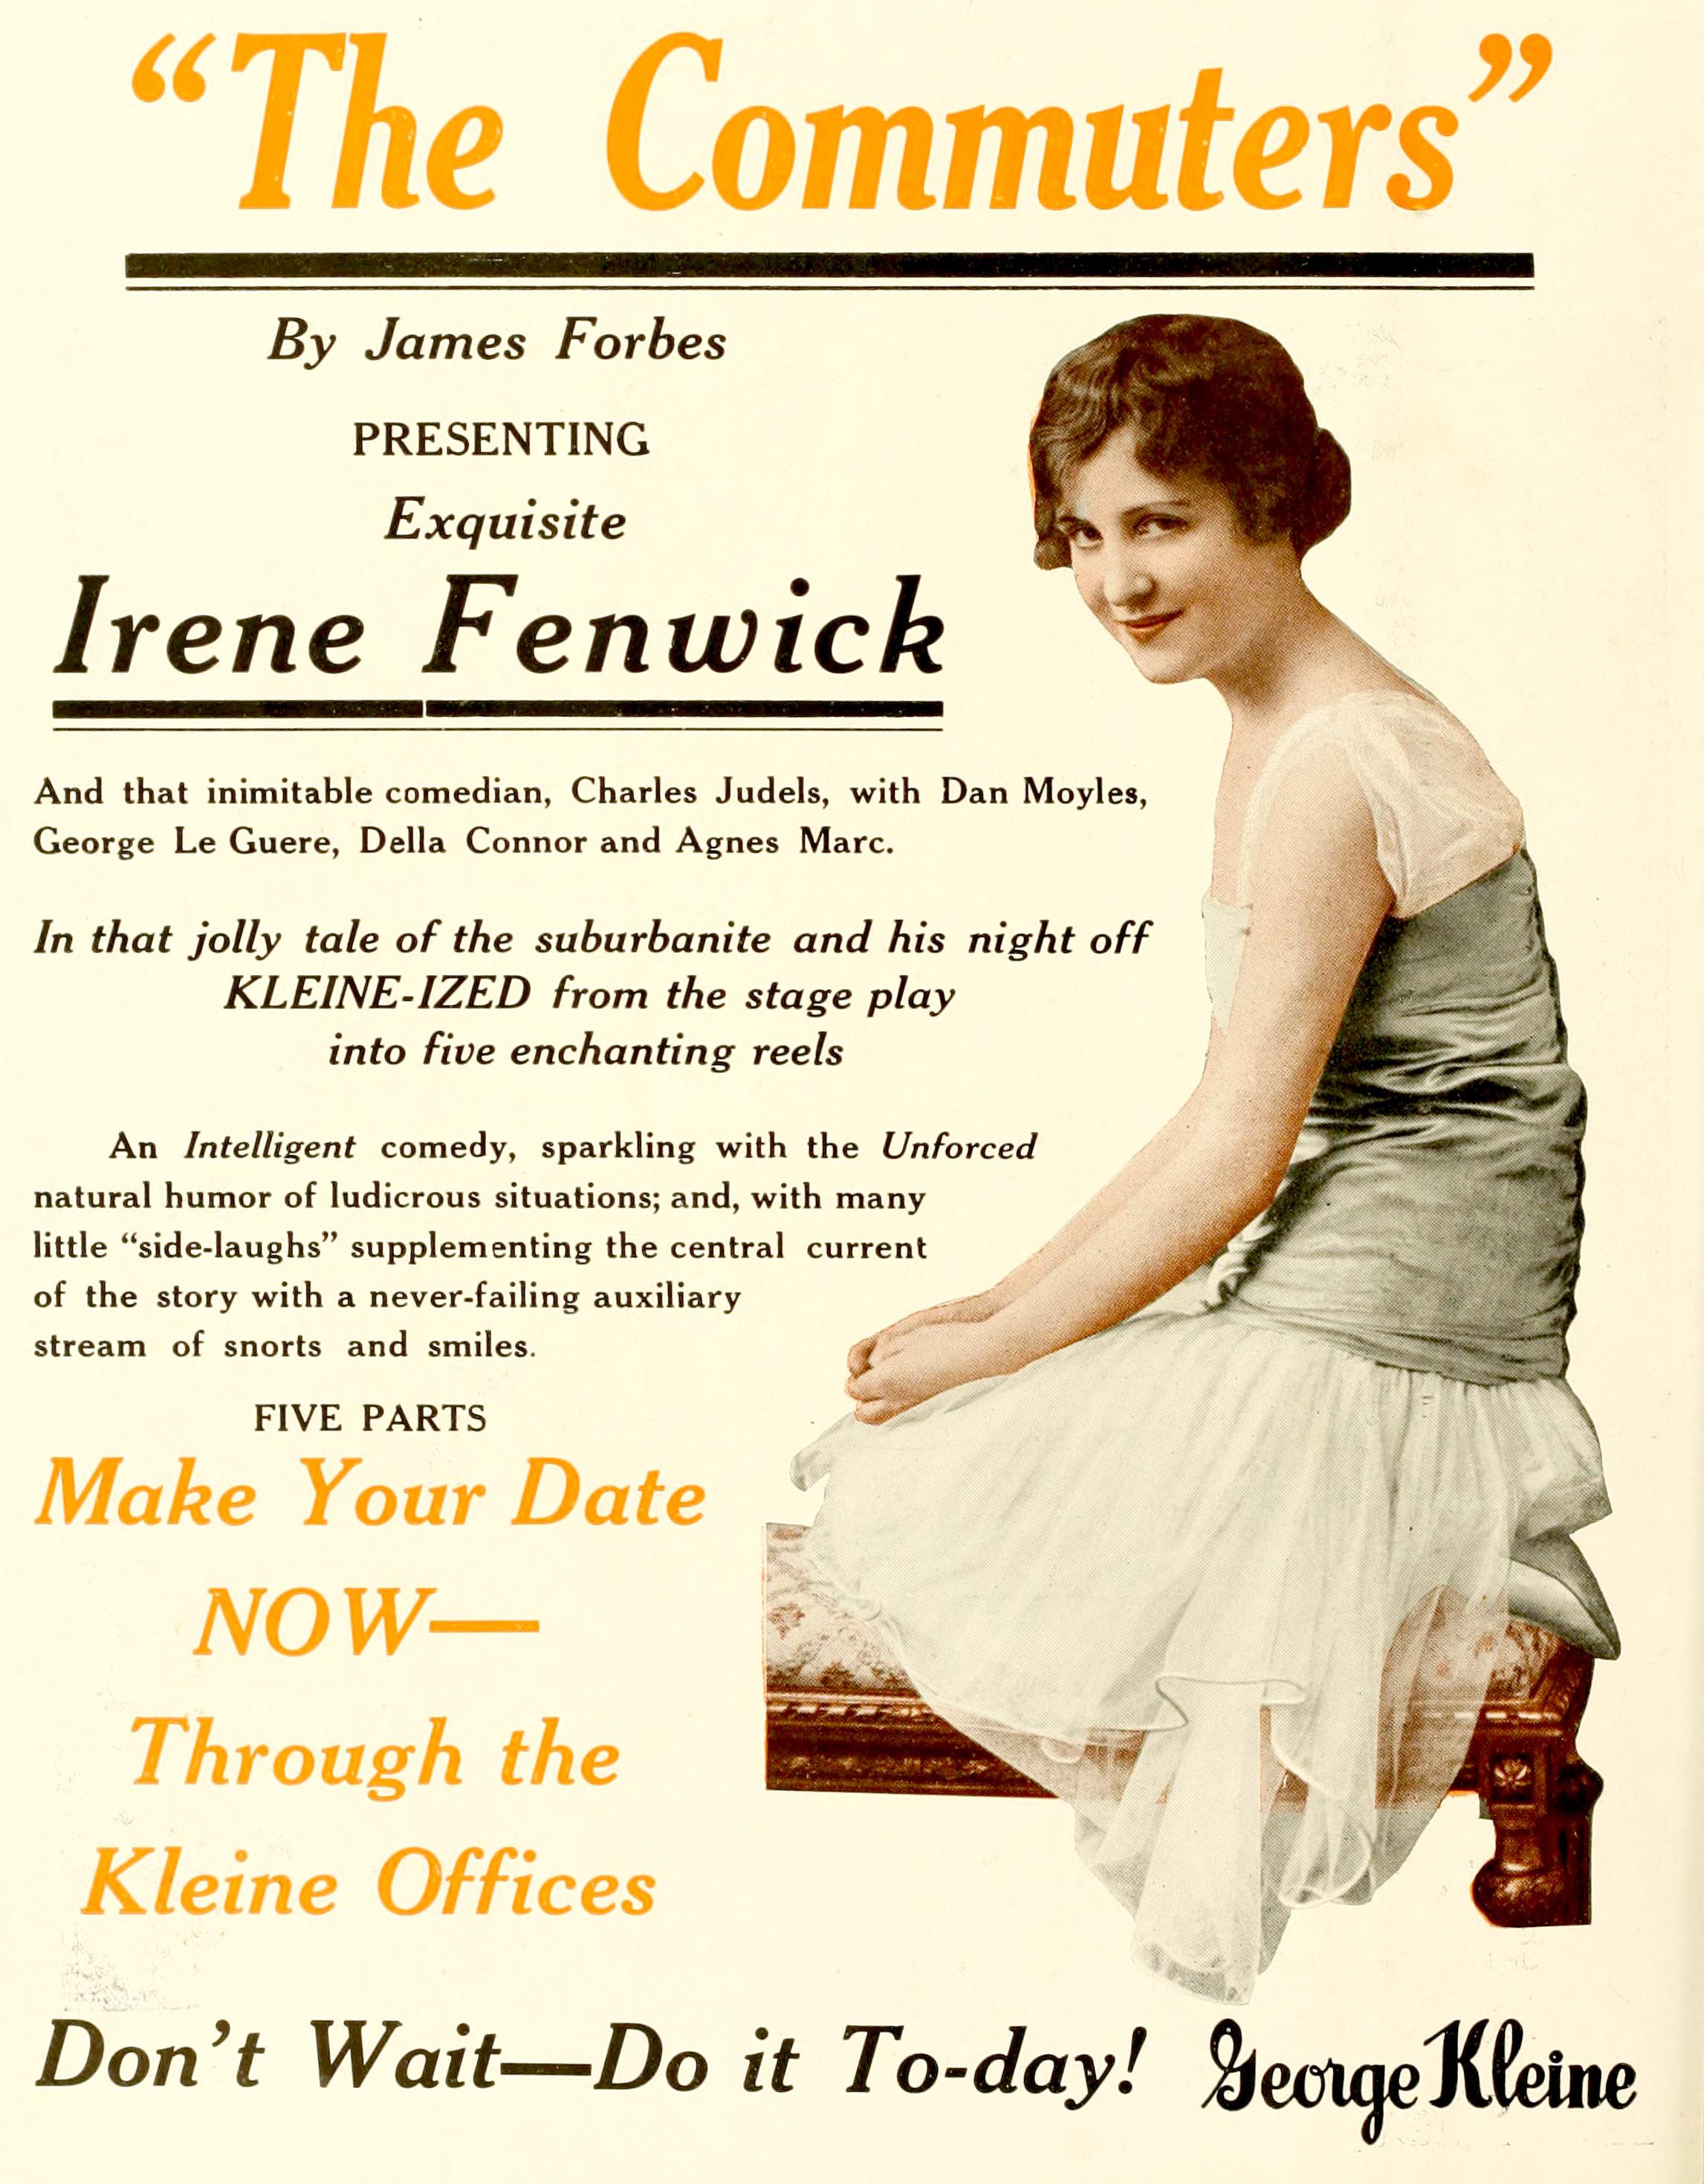 Irene Fenwick Irene Fenwick new picture